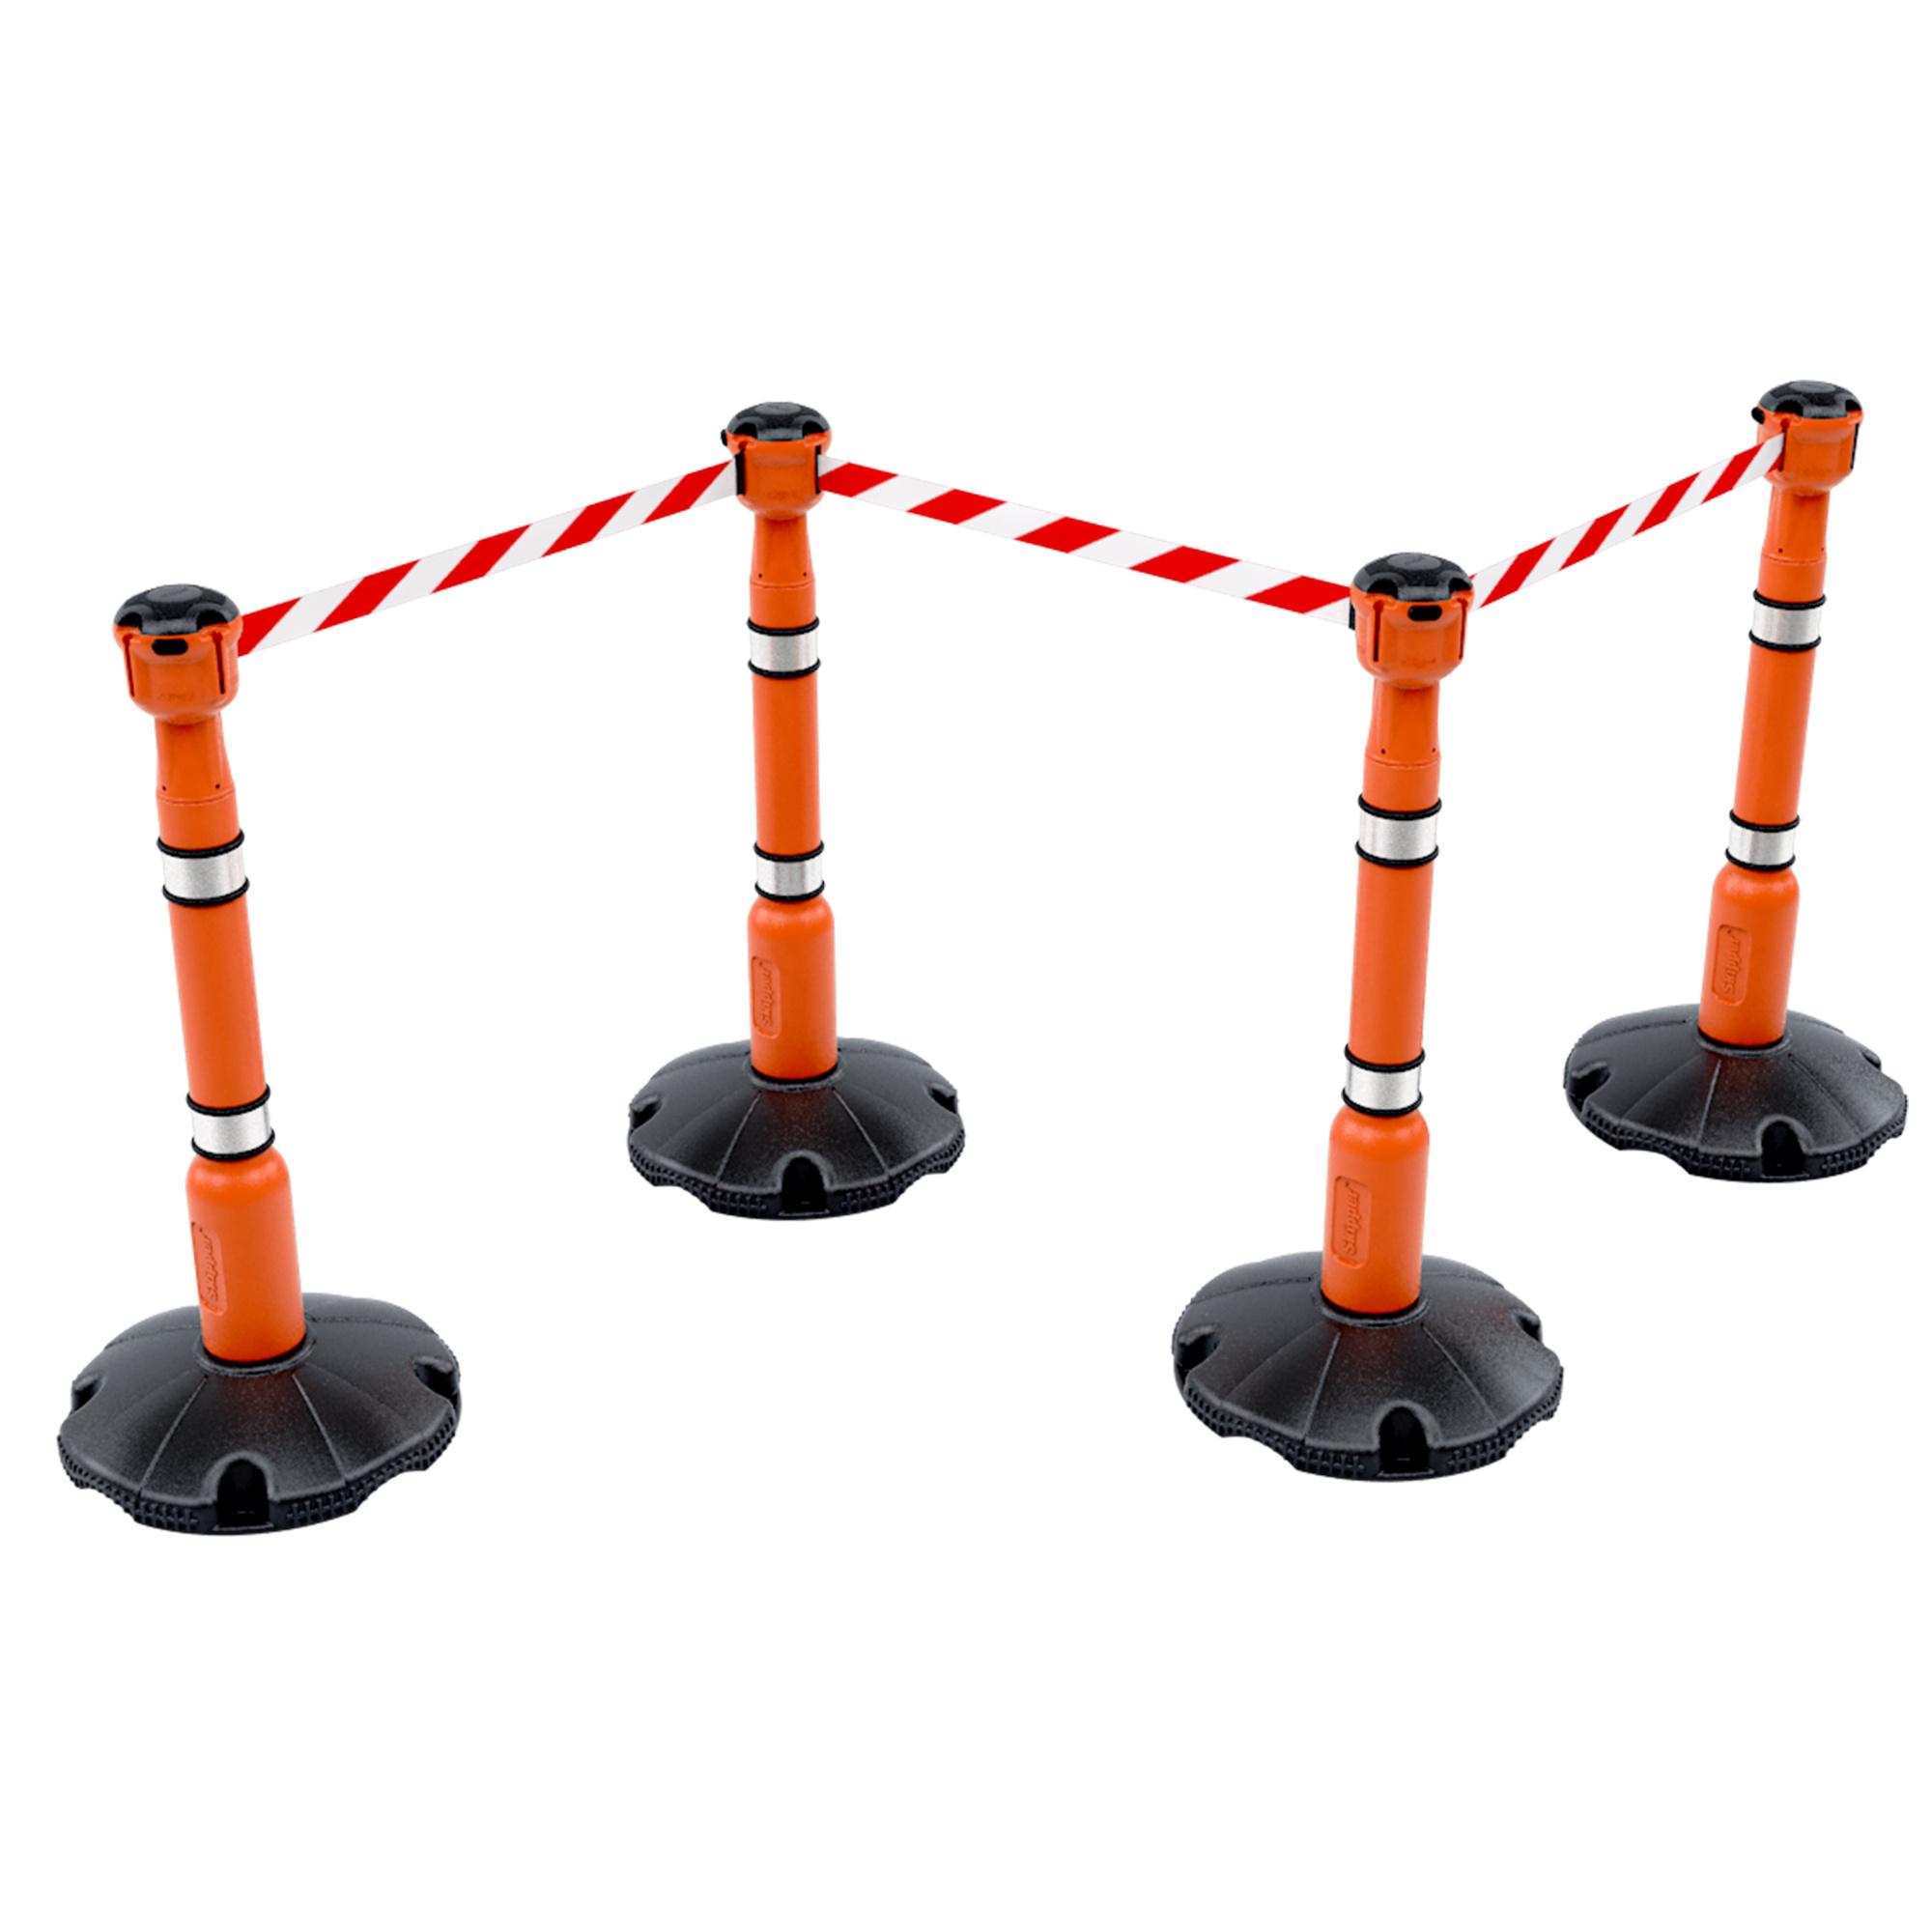 SKIPPER SKIPPER barrier belt unit  with 9 meters red/white tape